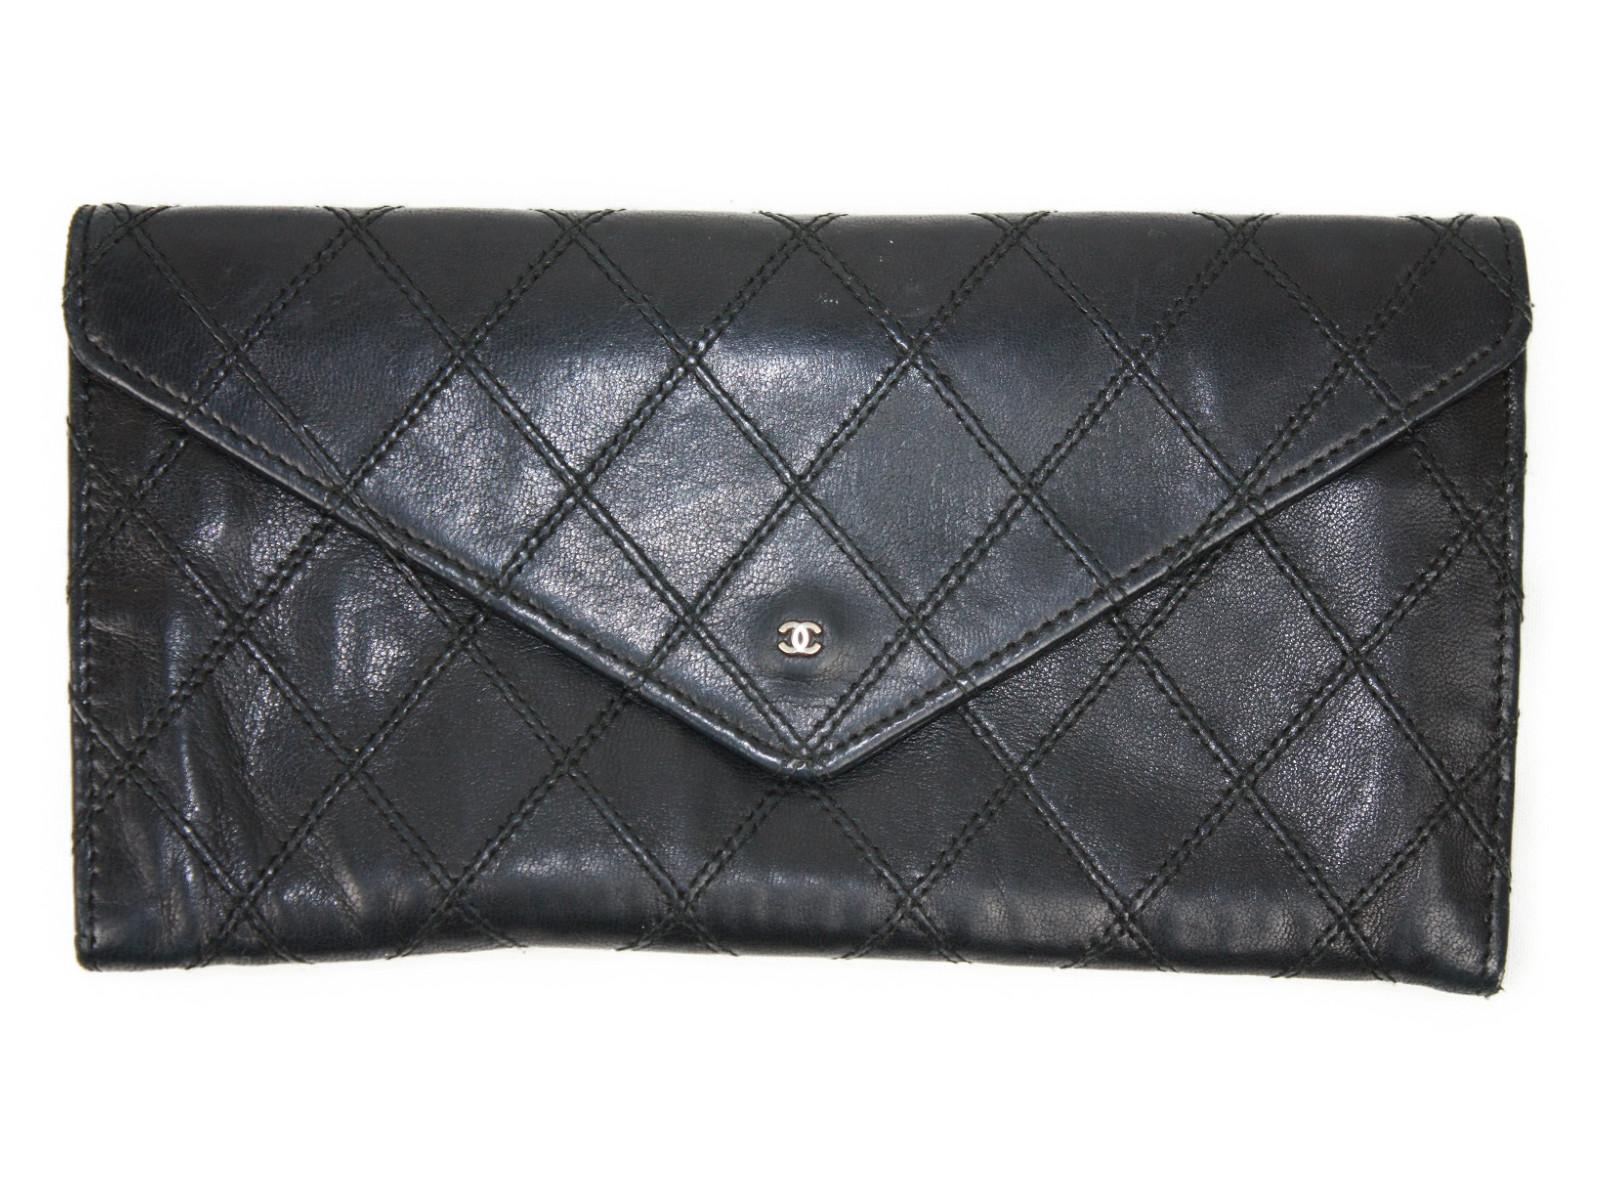 CHANEL 二つ折り長財布 ボタン式ブラック/黒 ココマーク レディースマトラッセ 上品【中古】